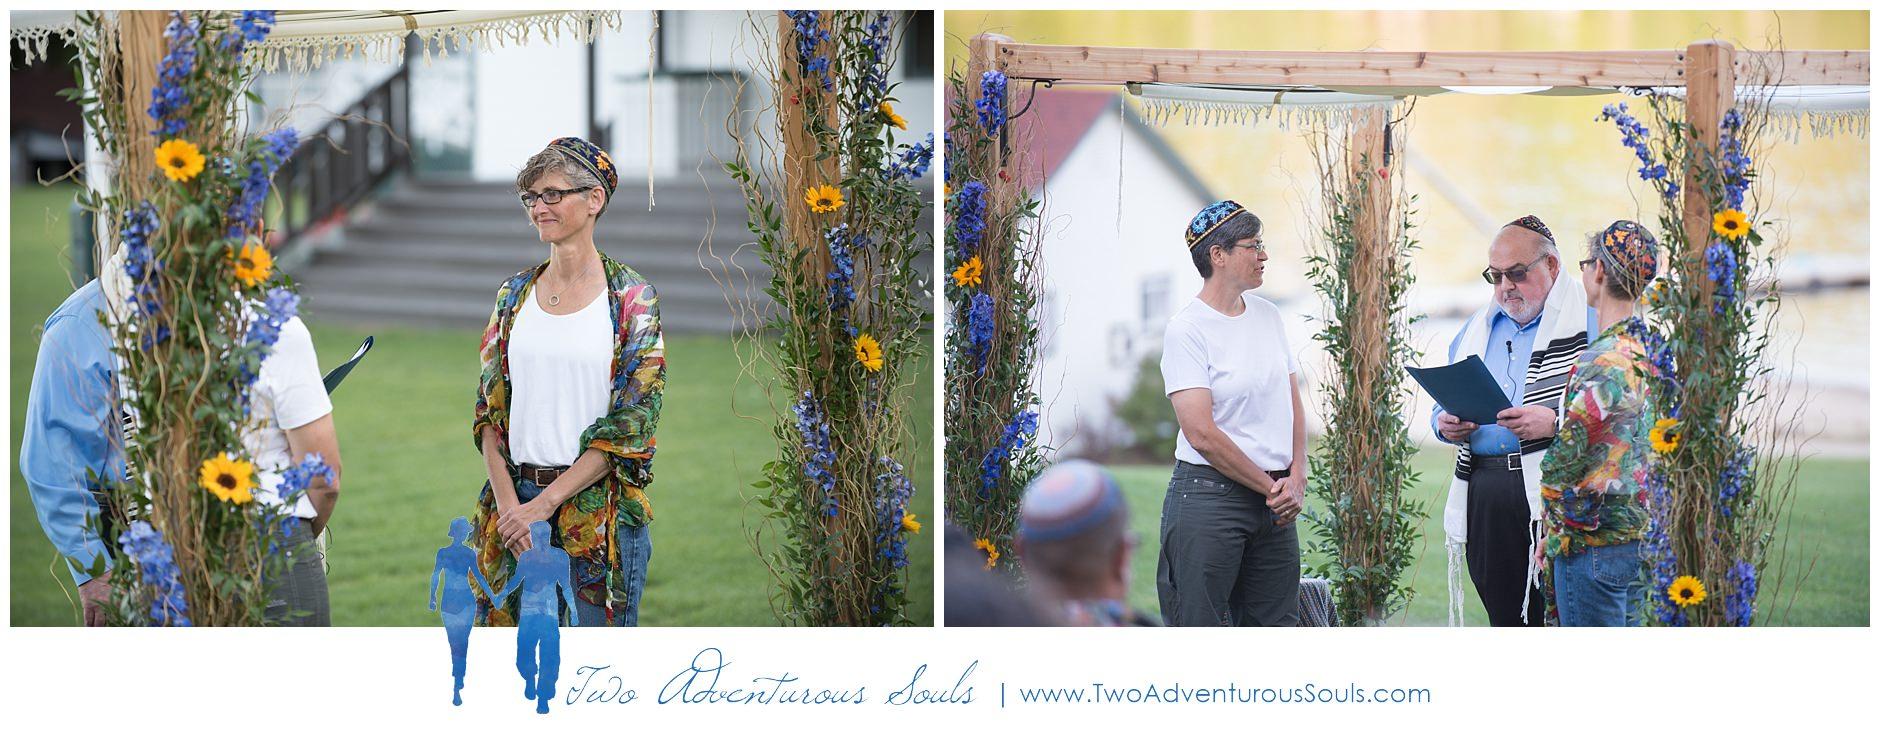 090217-Mindy-Karen-sneaks-61_WEB-Maine-Wedding-and-Portrait-Photographer.jpg